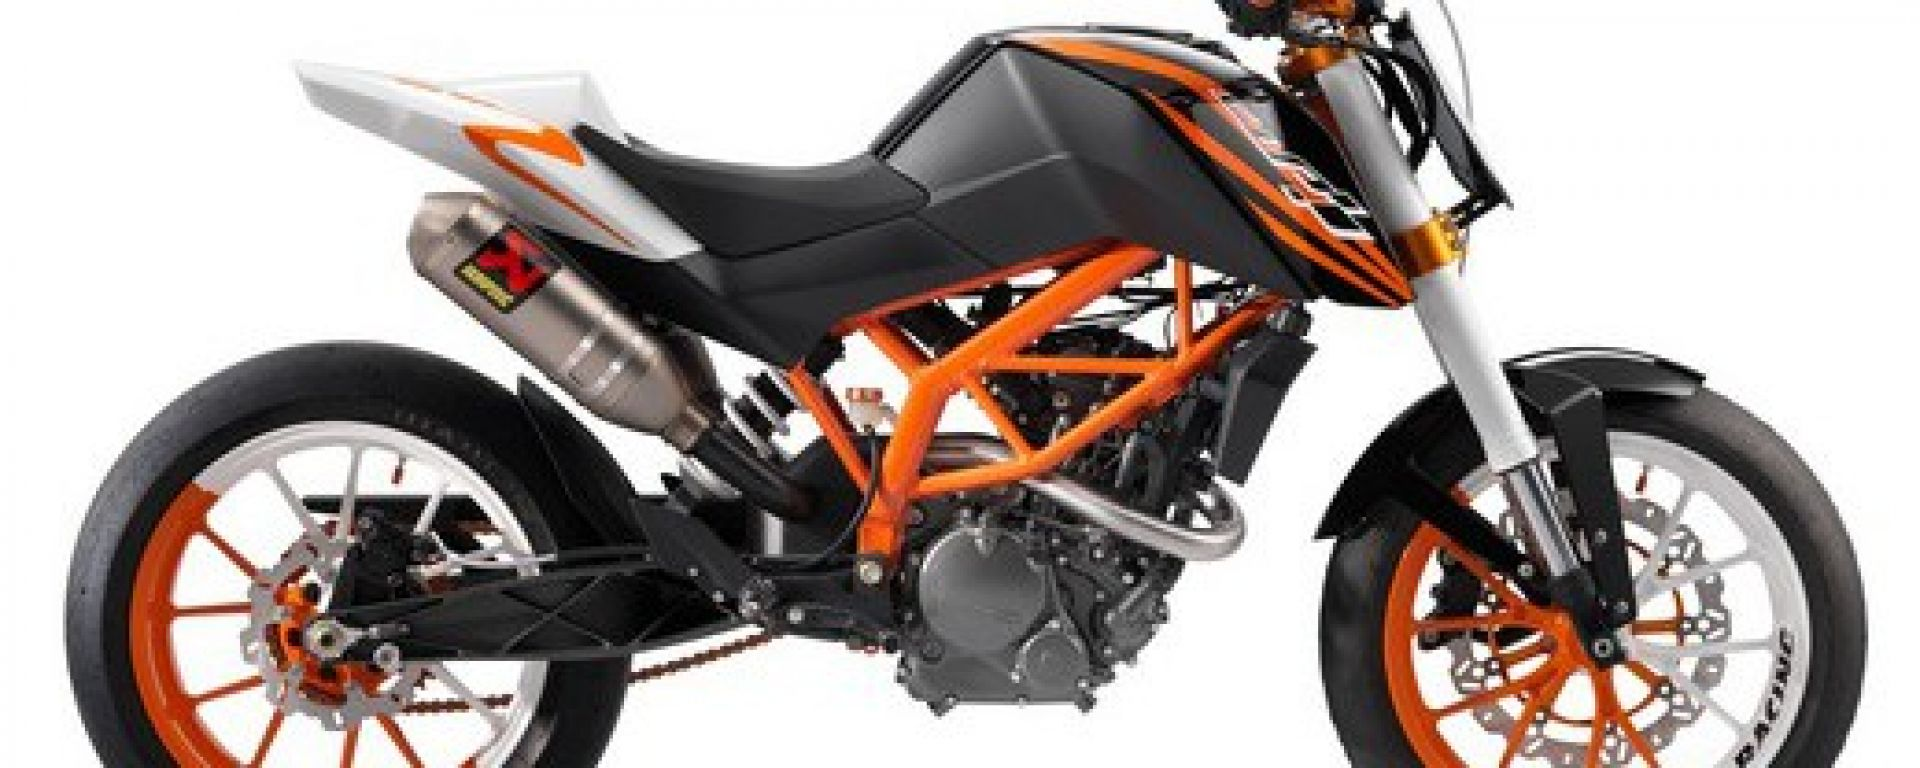 KTM 125 Project